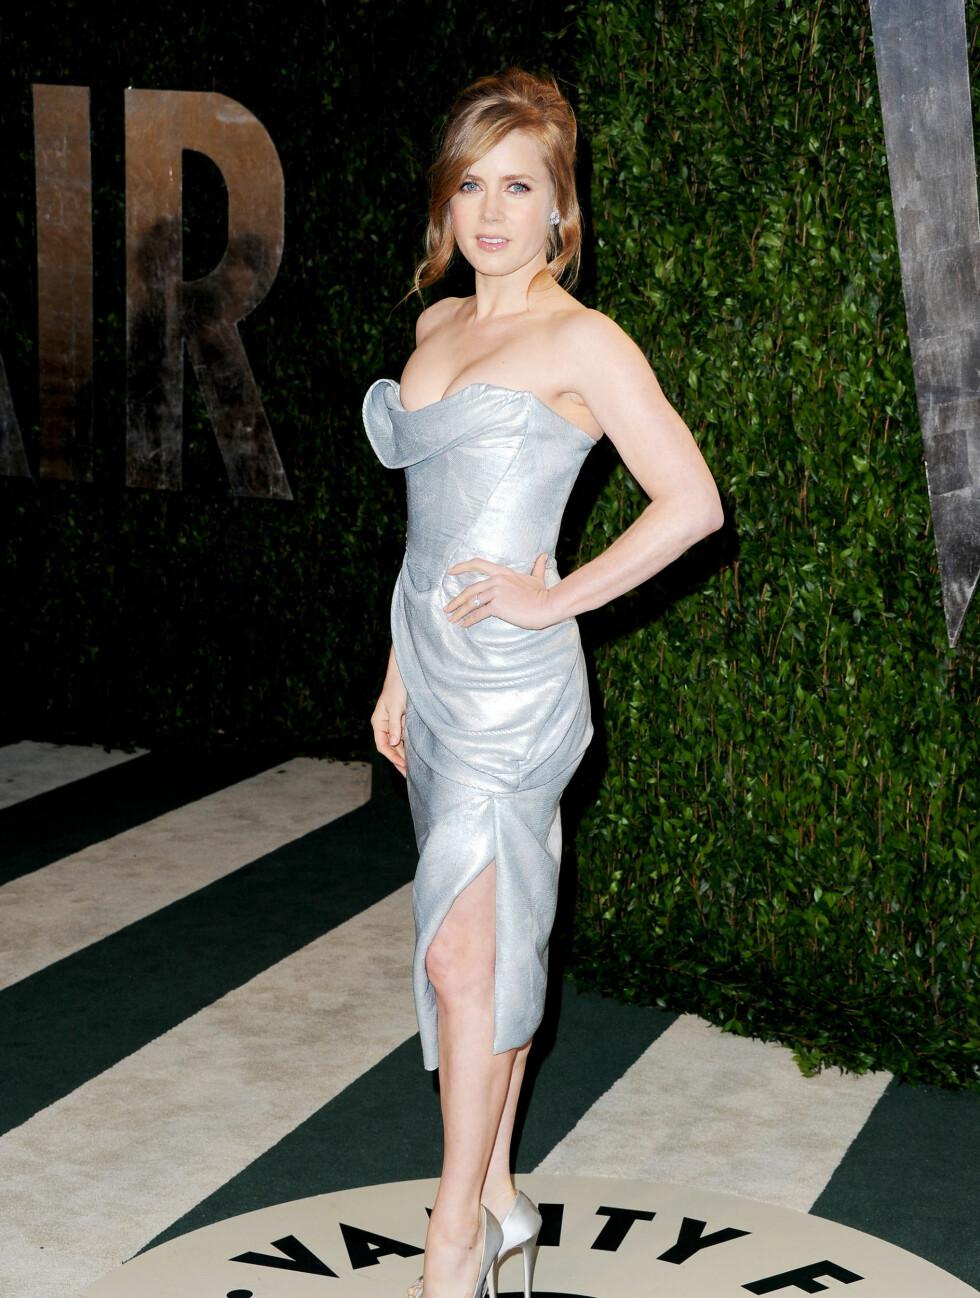 DYP KLØFT: Amy Adams kom på Oscar-fest i en sølvgrå kjole med svært dyp utringning. Foto: All Over Press